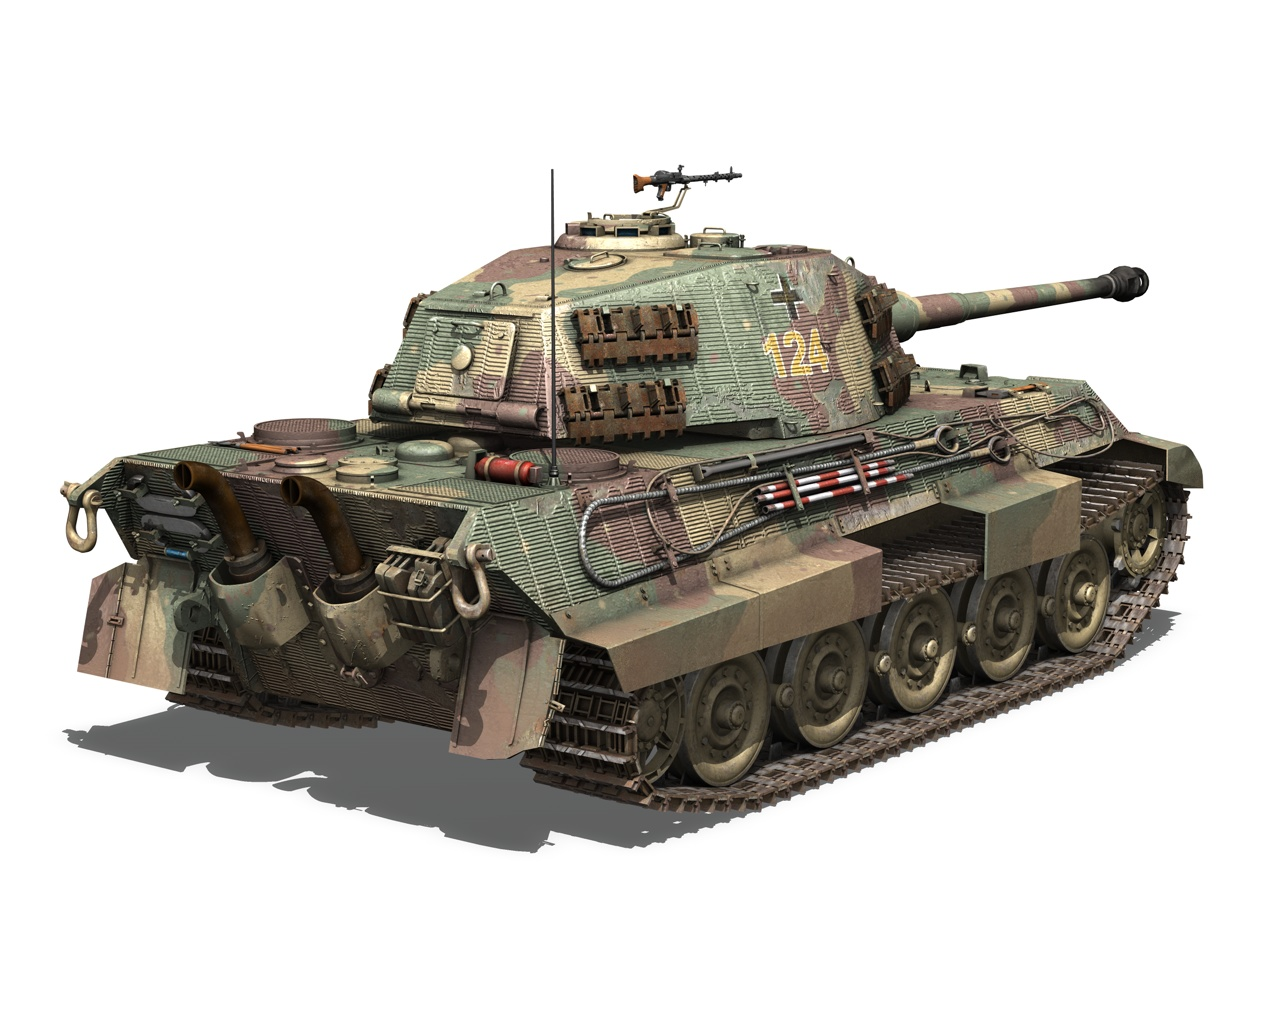 kfz tiger